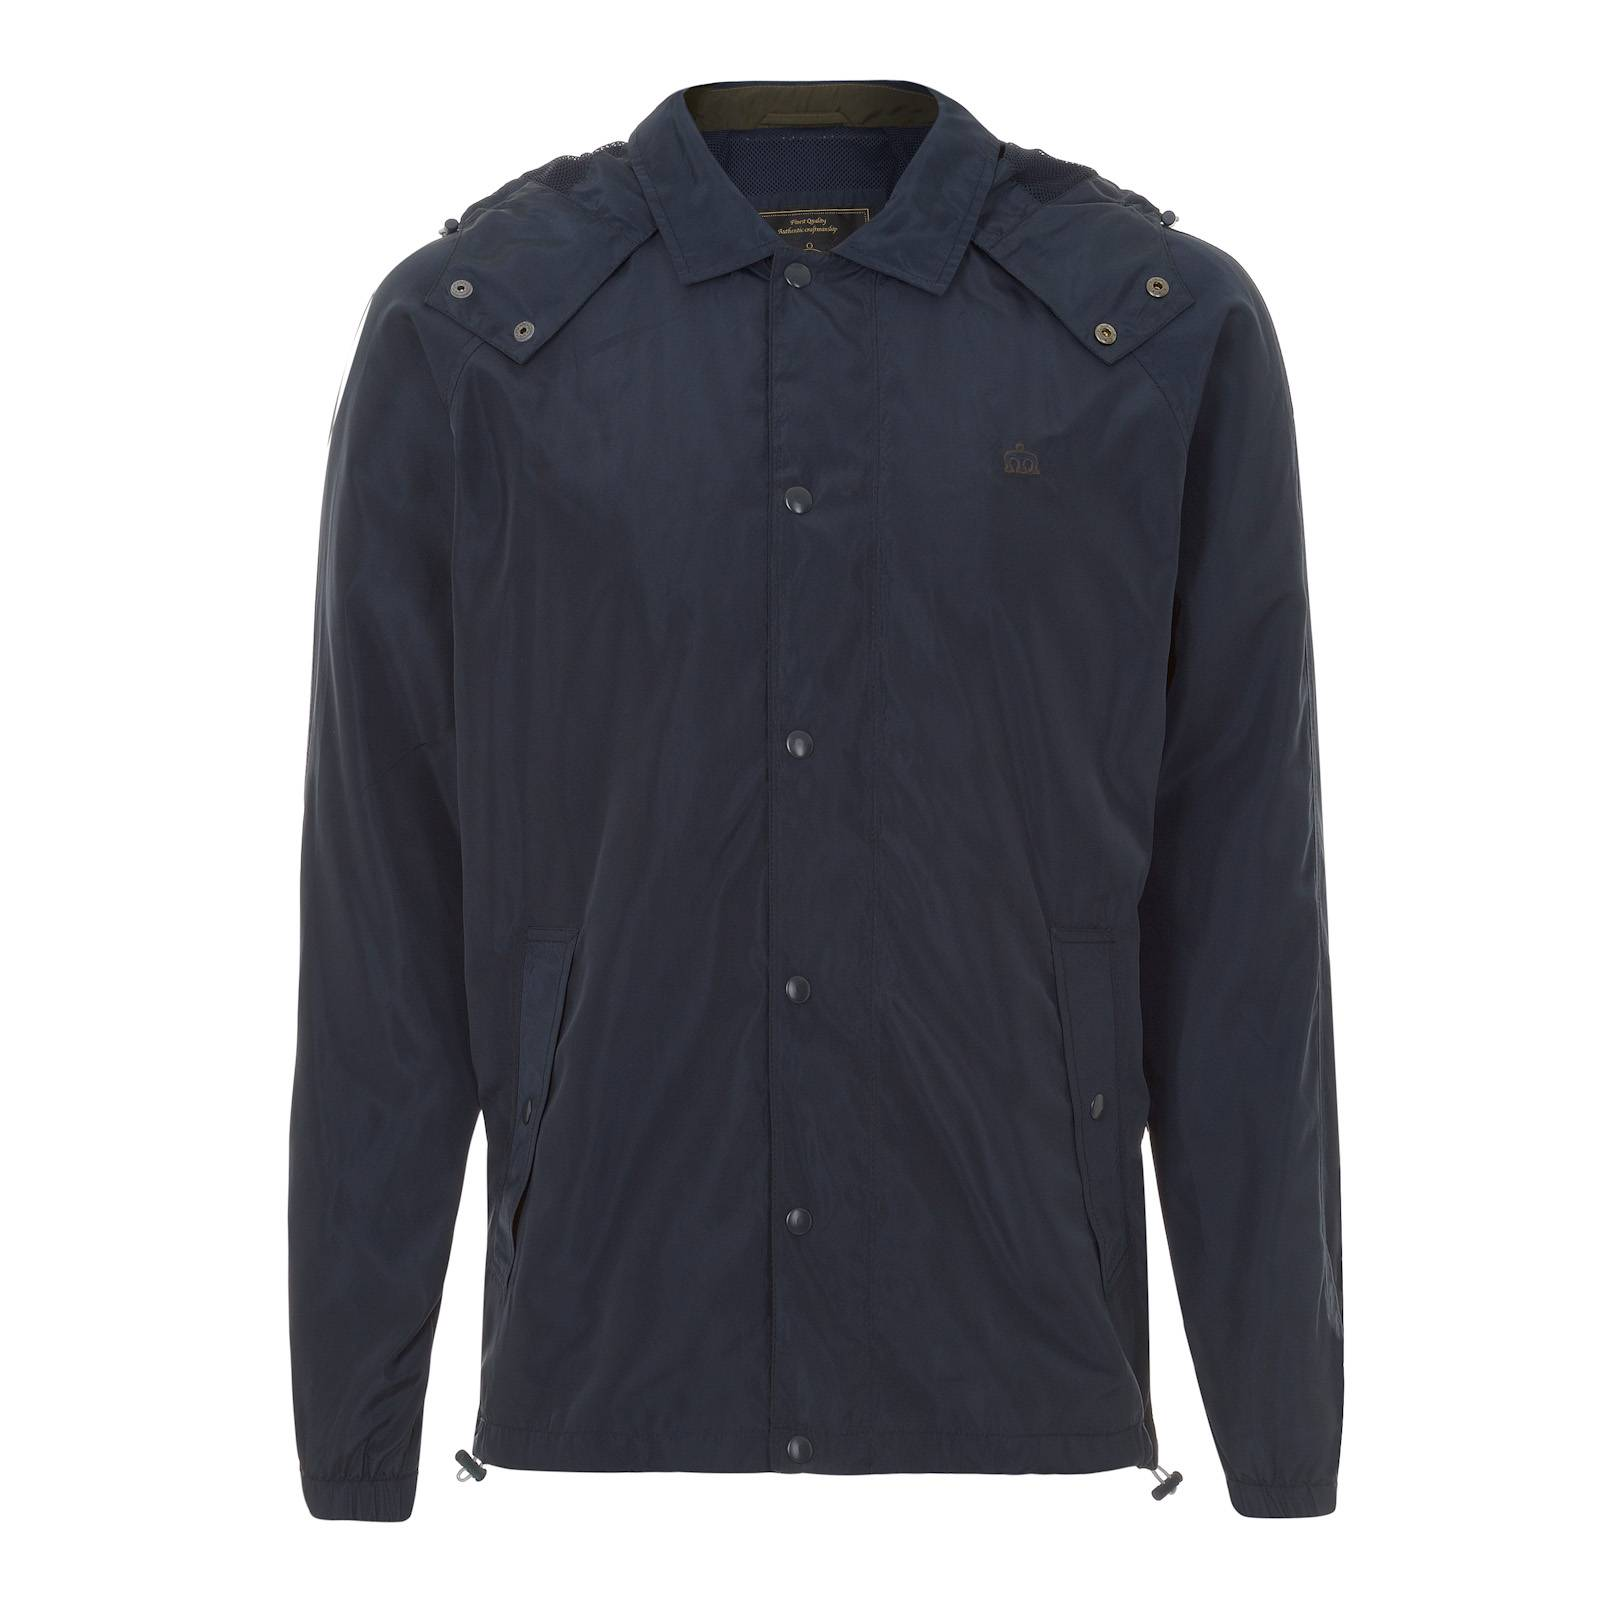 Куртка MontereyВерхняя одежда<br><br><br>Артикул: 1115101<br>Материал: 100% нейлон<br>Цвет: синий<br>Пол: Мужской